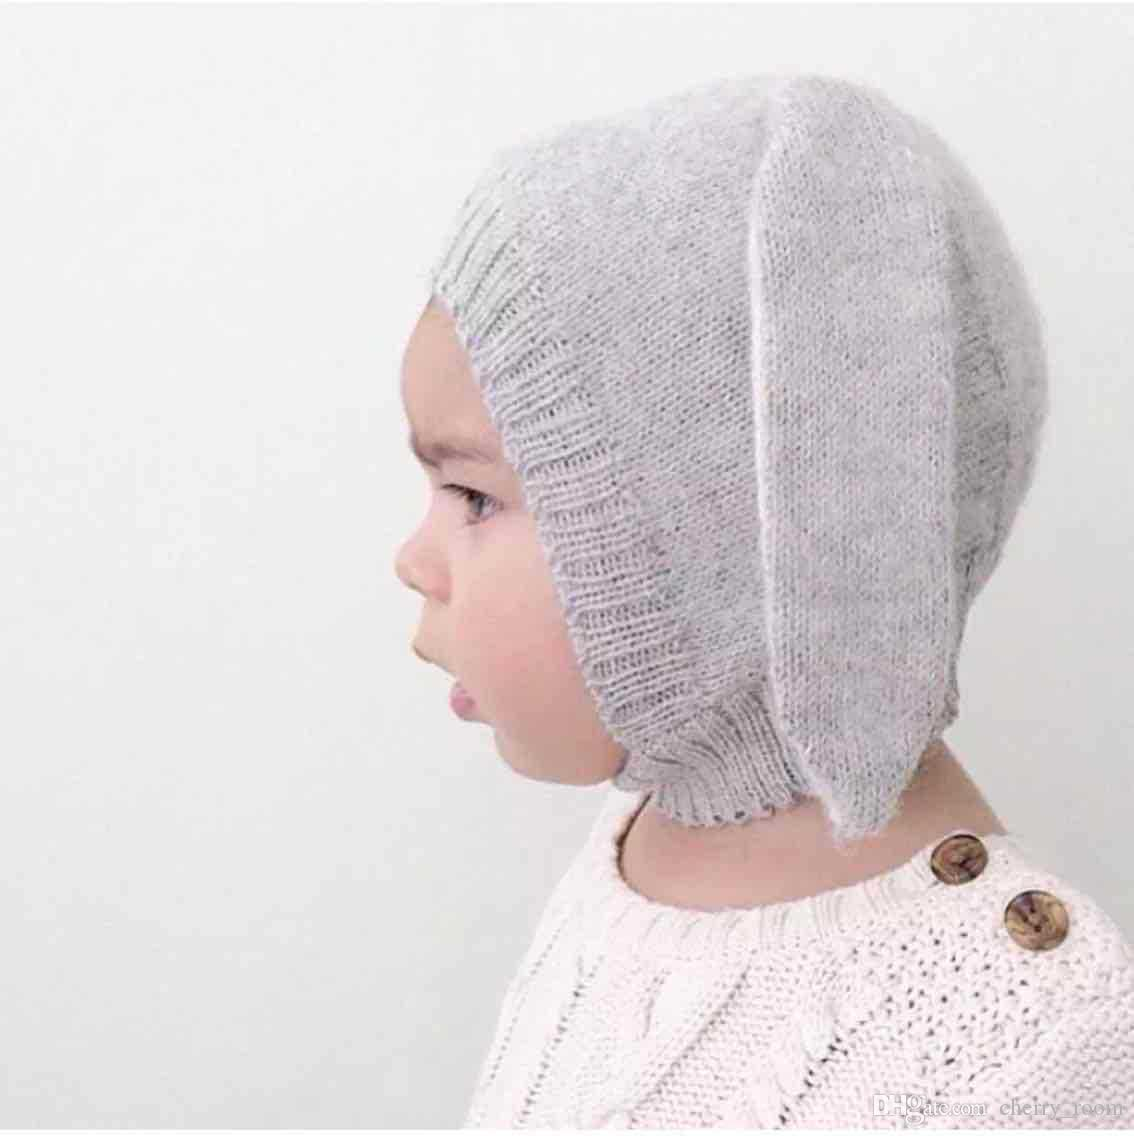 New Cute Baby Hats Caps Fashion 2017 Cartoon knit Rabbit Sweater Ears Crochet Hat Babies Boy Girl Caps Lovely cap A6401